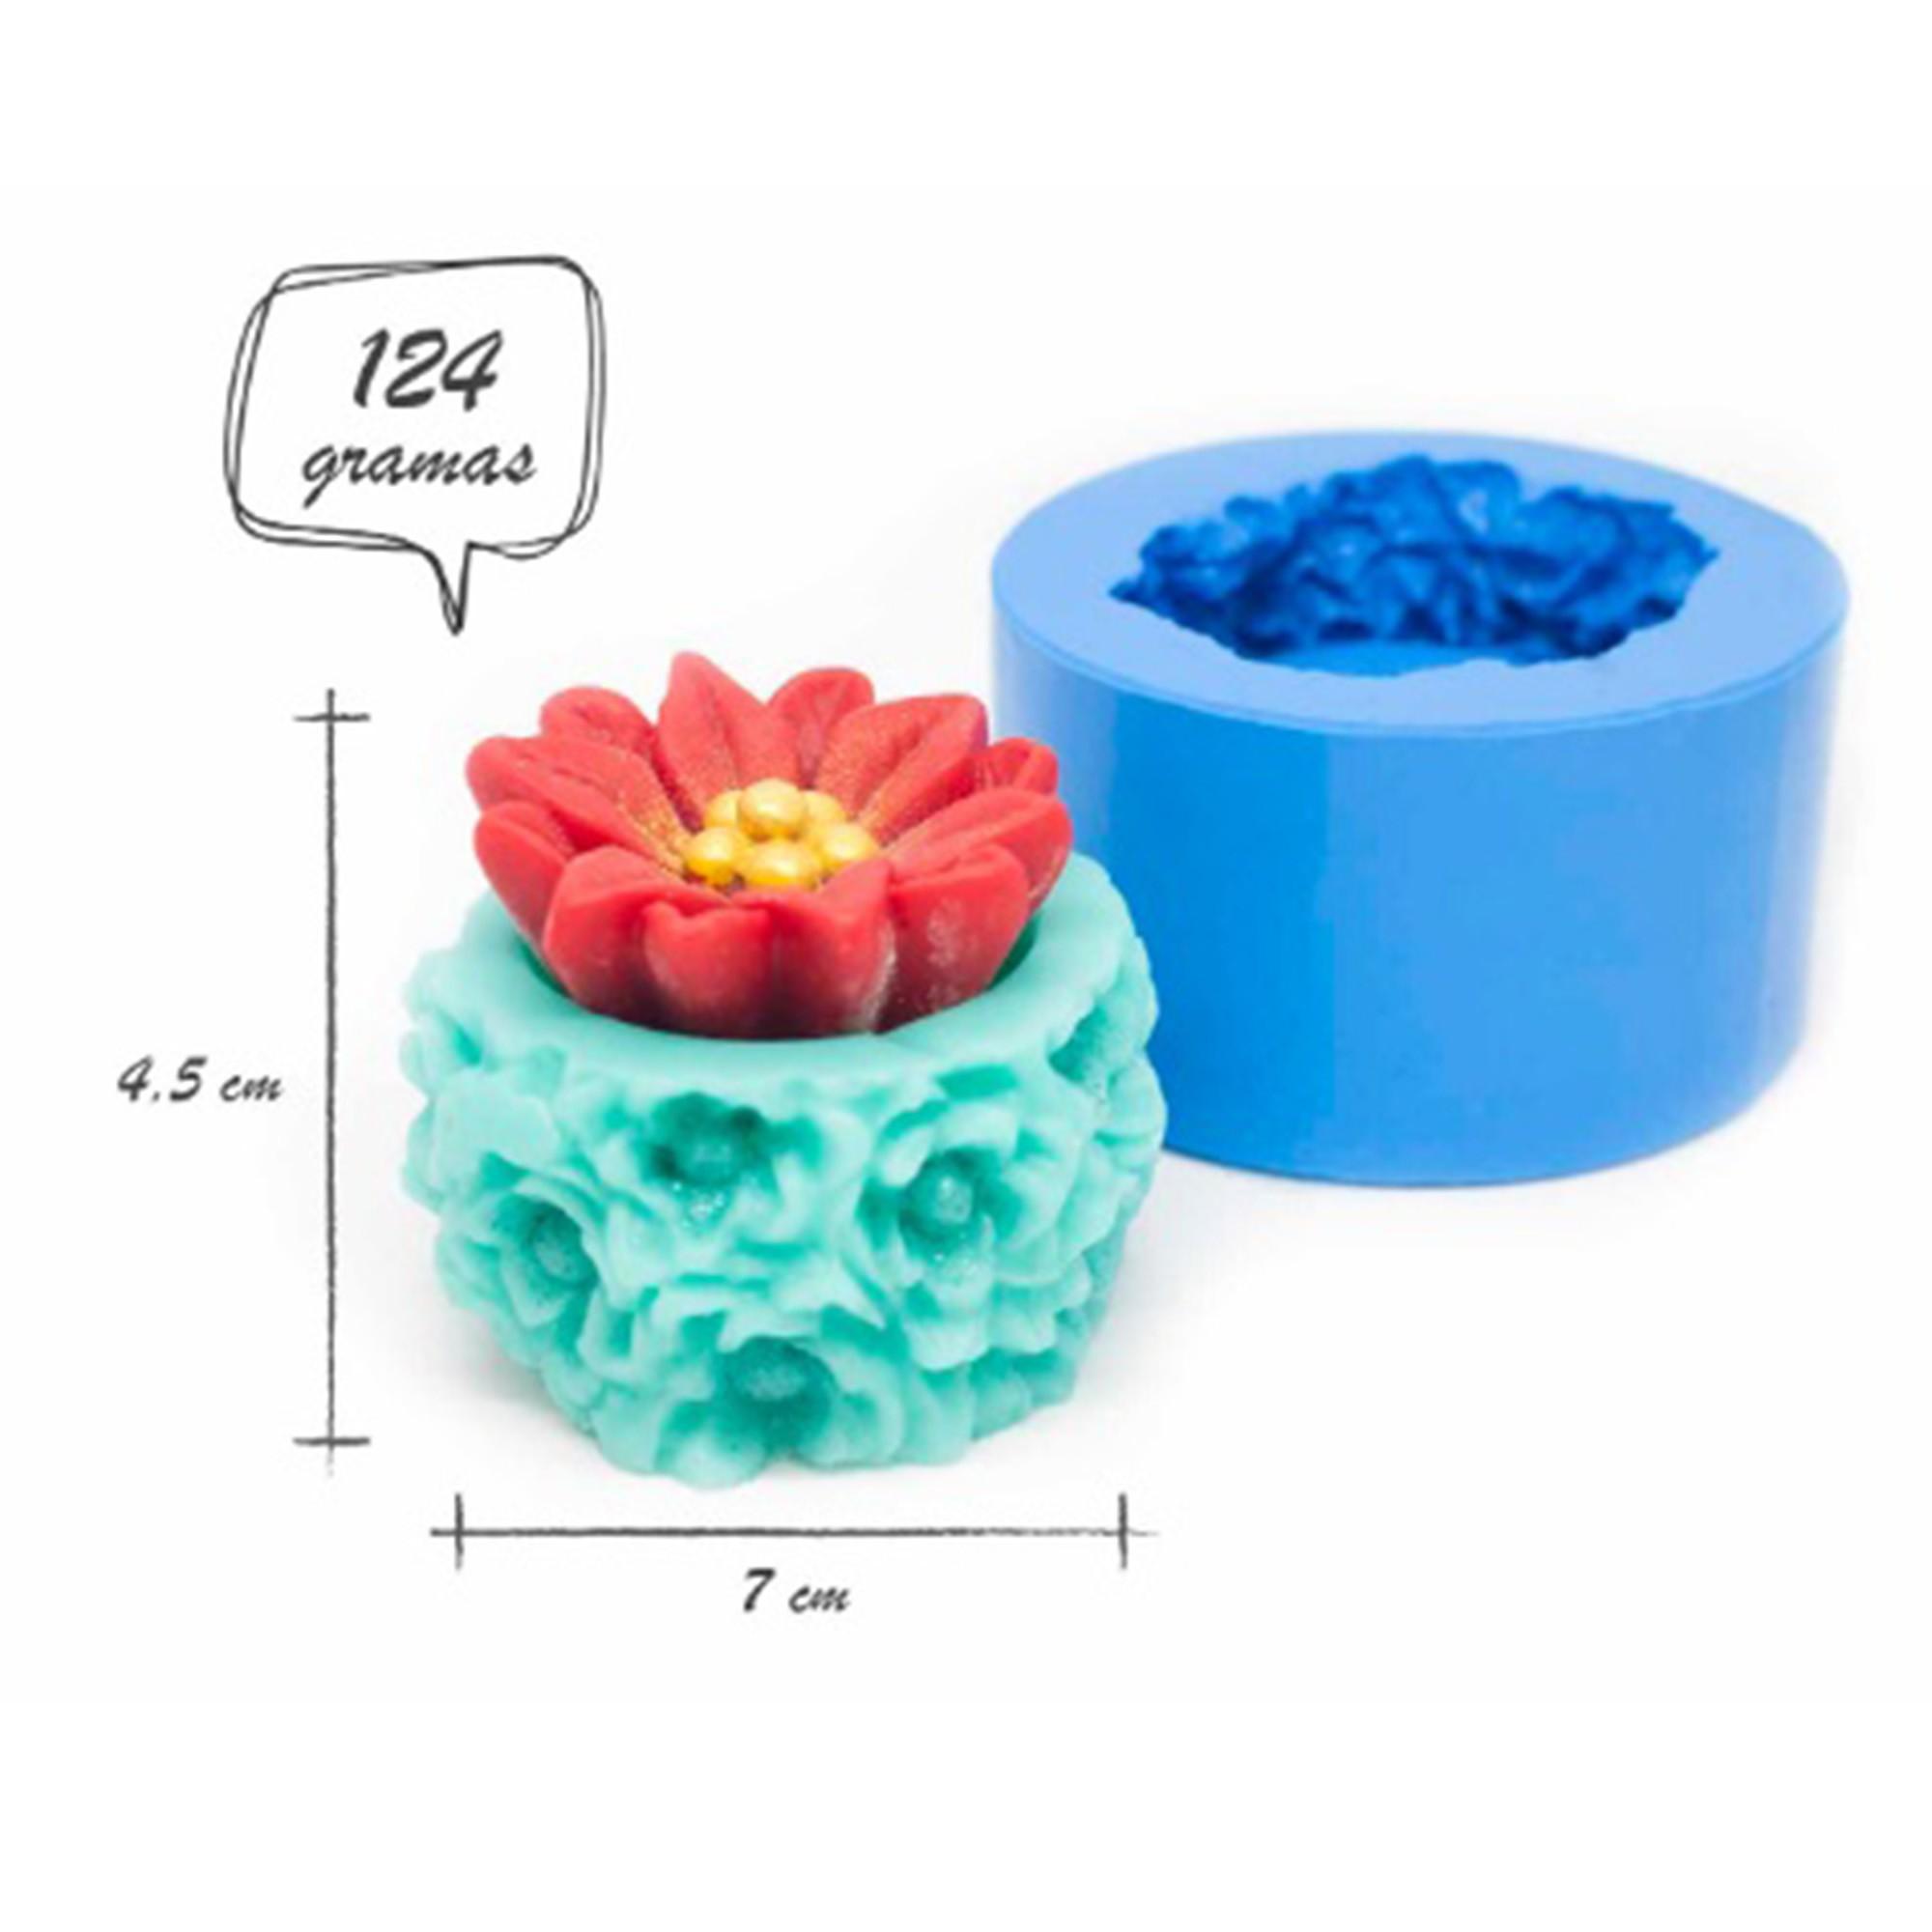 Molde de silicone Vaso provence